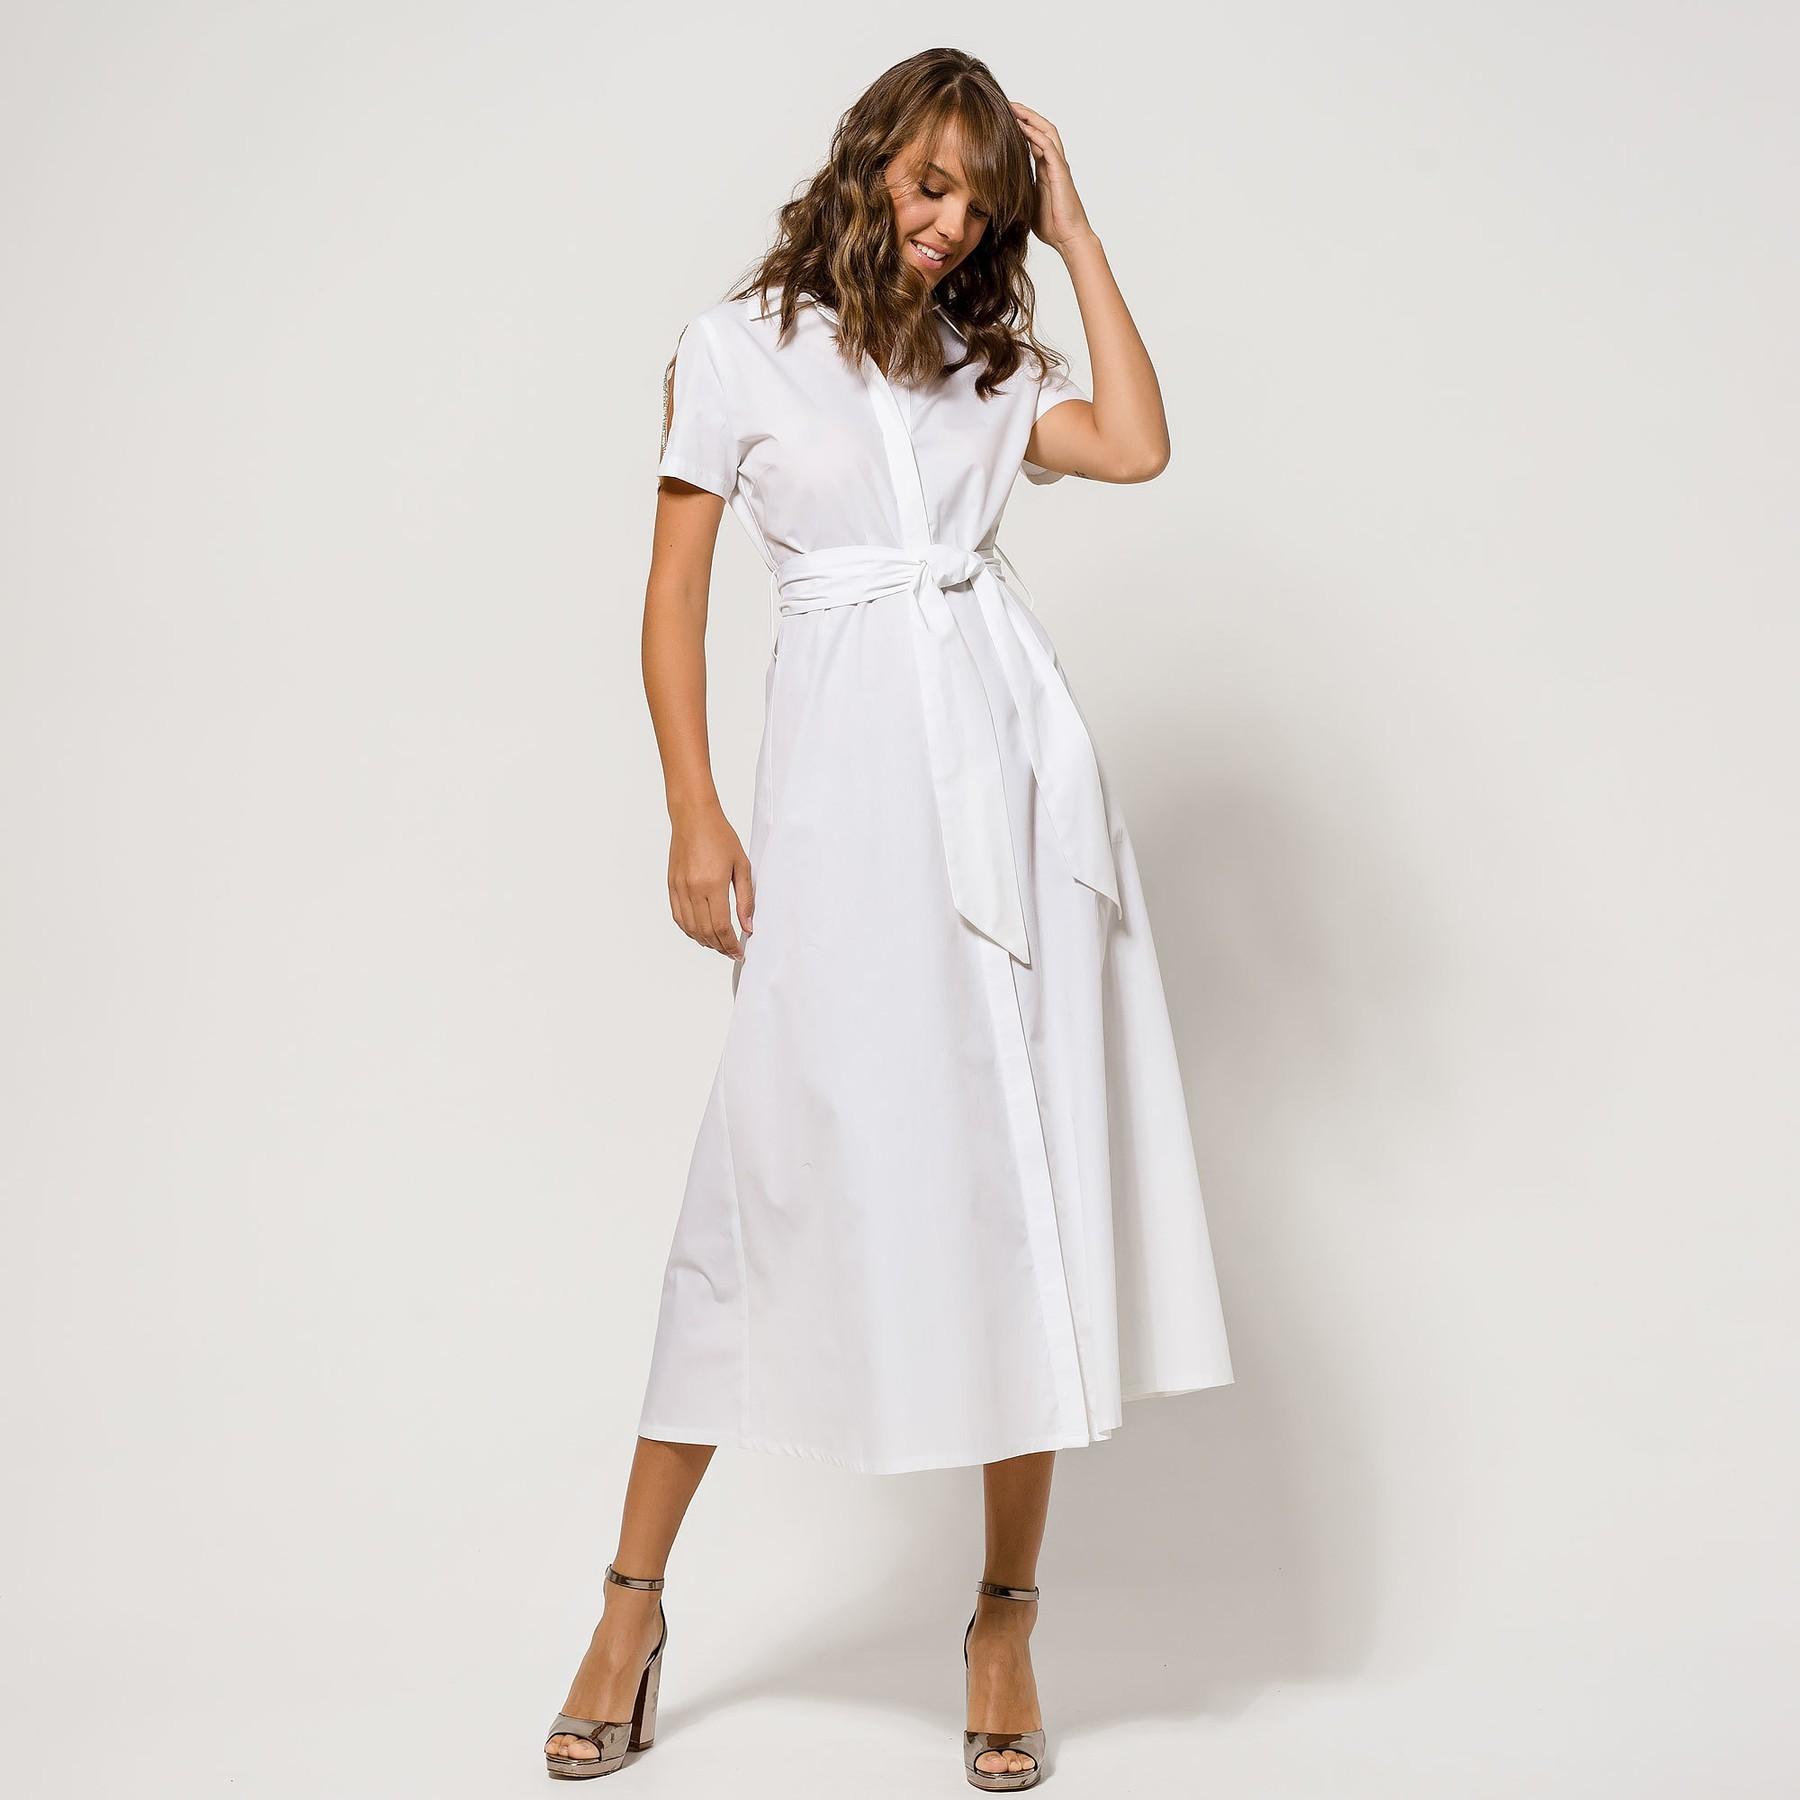 Shirt Dress with Glitter Shoulder Detail